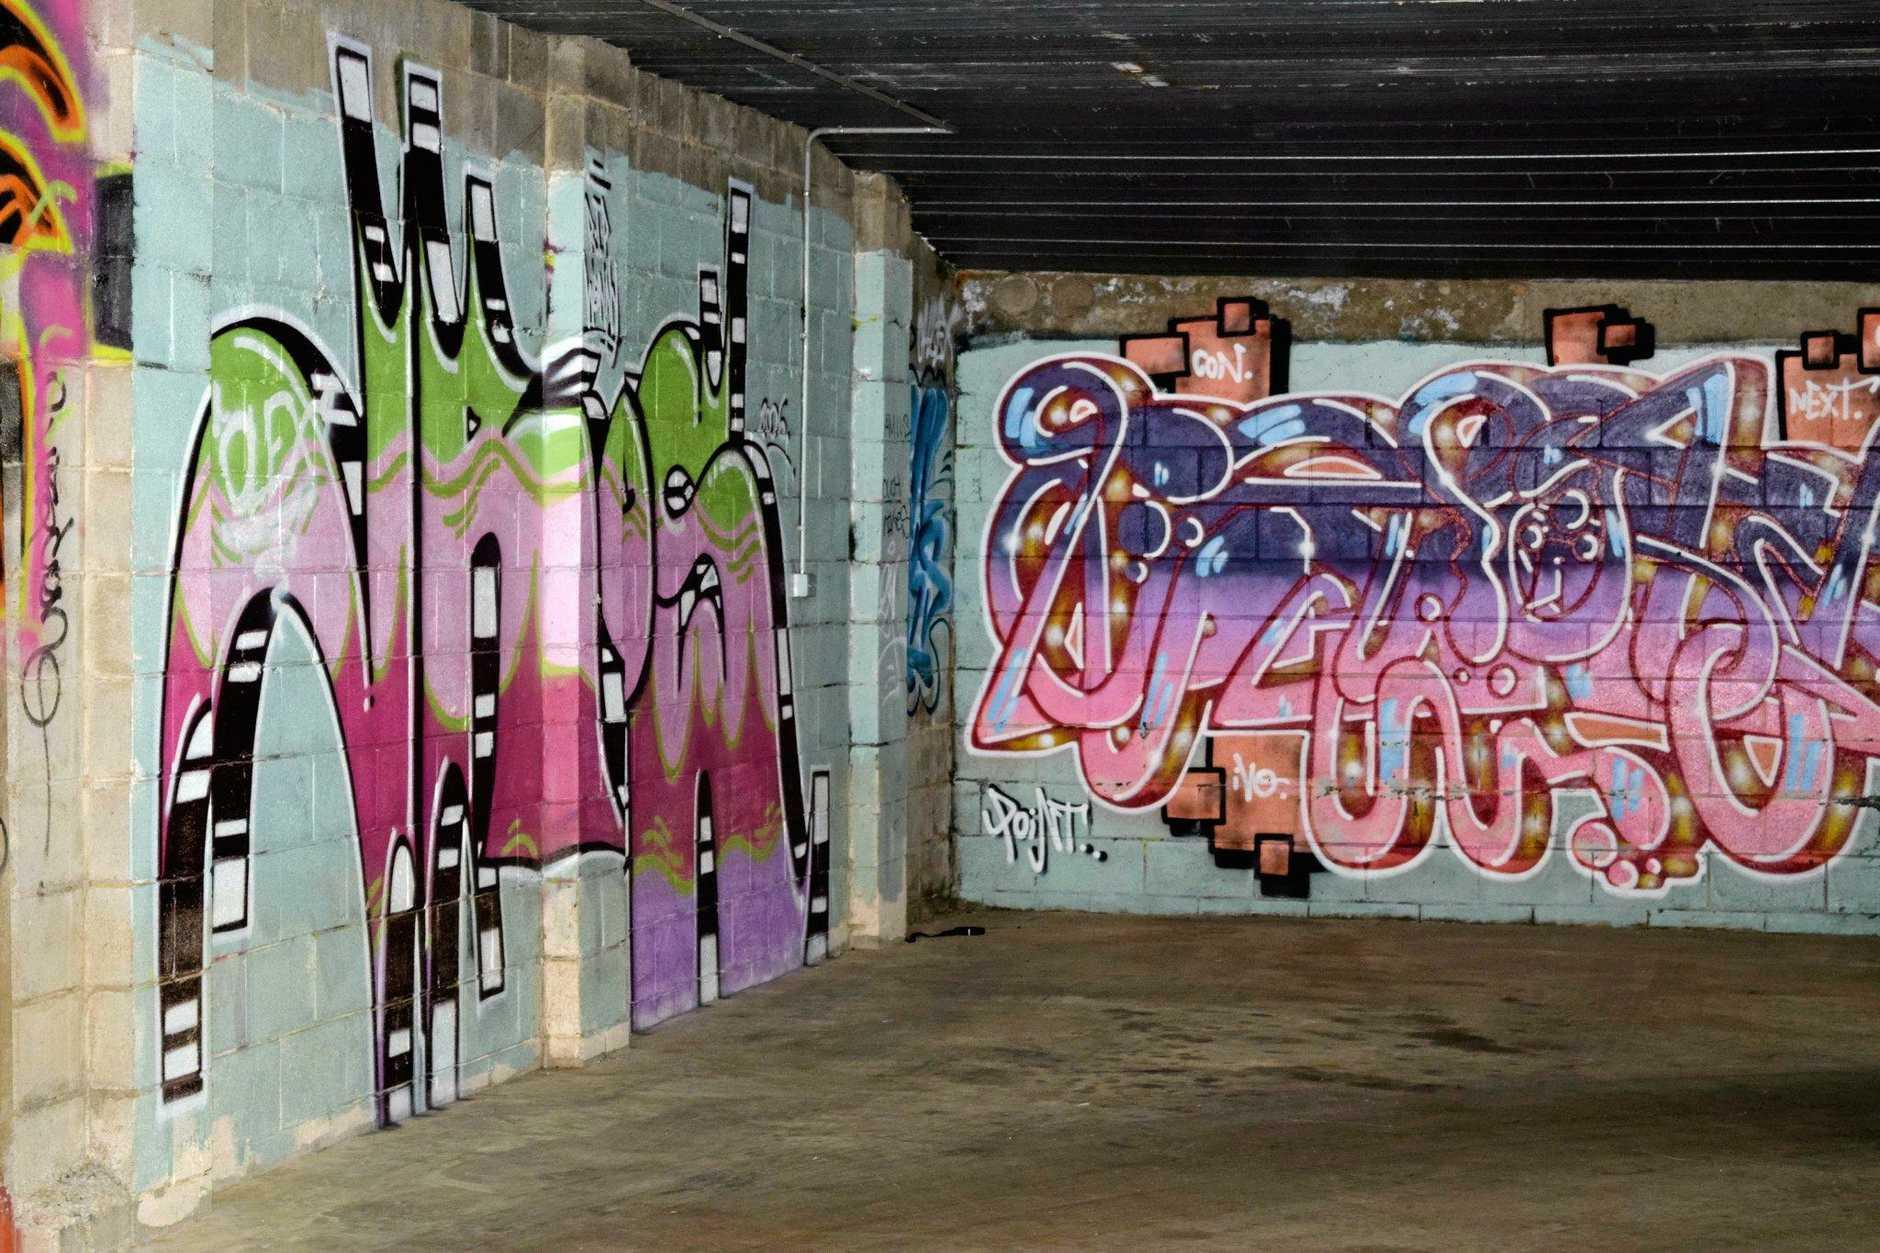 Graffiti in Murwillumbah, with Geraldine O'Flynn.